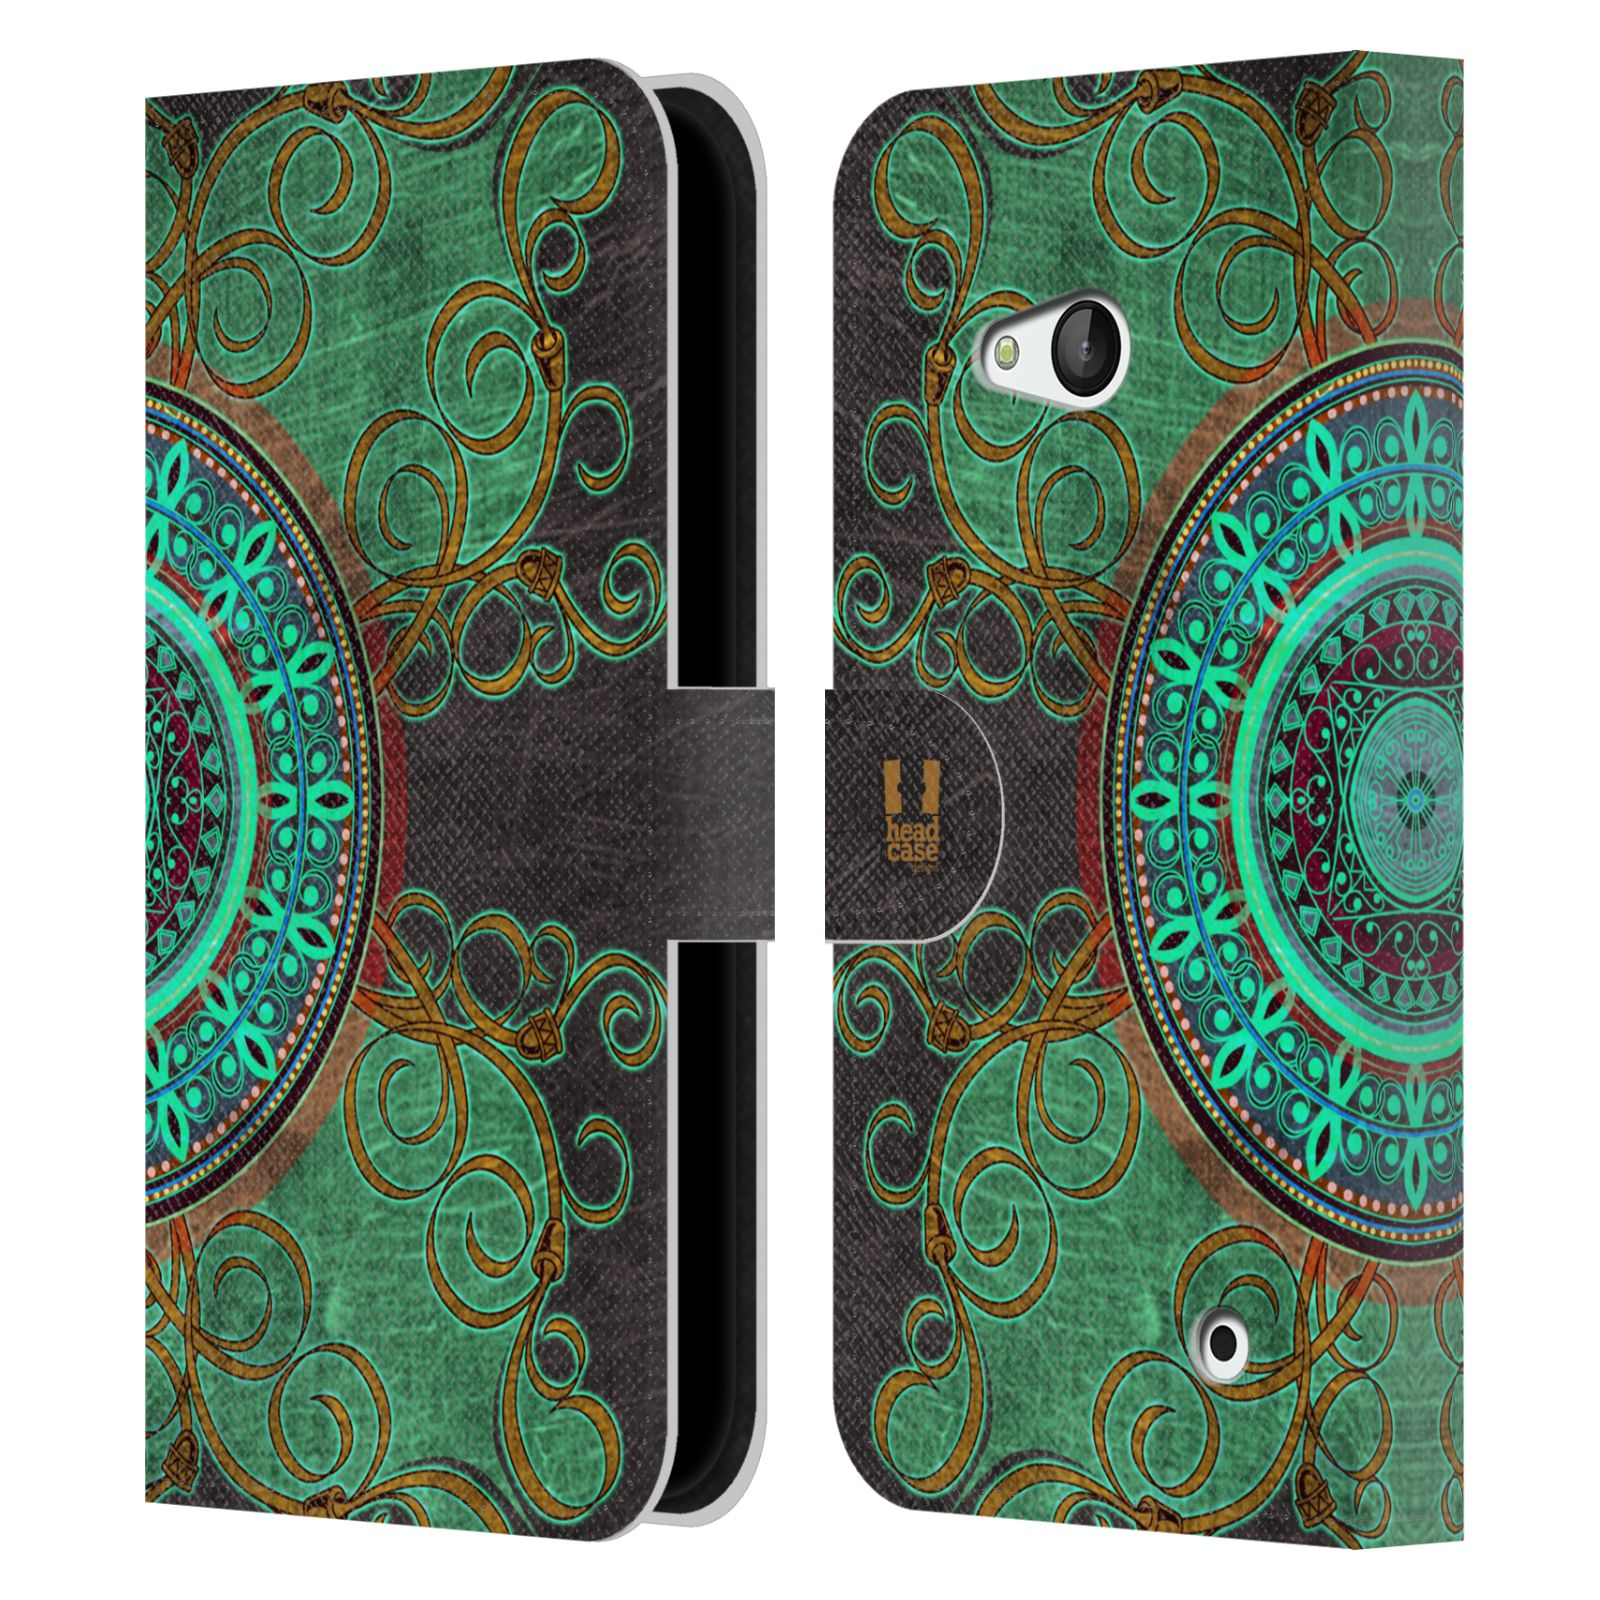 HEAD CASE Flipové pouzdro pro mobil NOKIA / MICROSOFT LUMIA 640 / LUMIA 640 DUAL ARABESKA mandala zelená